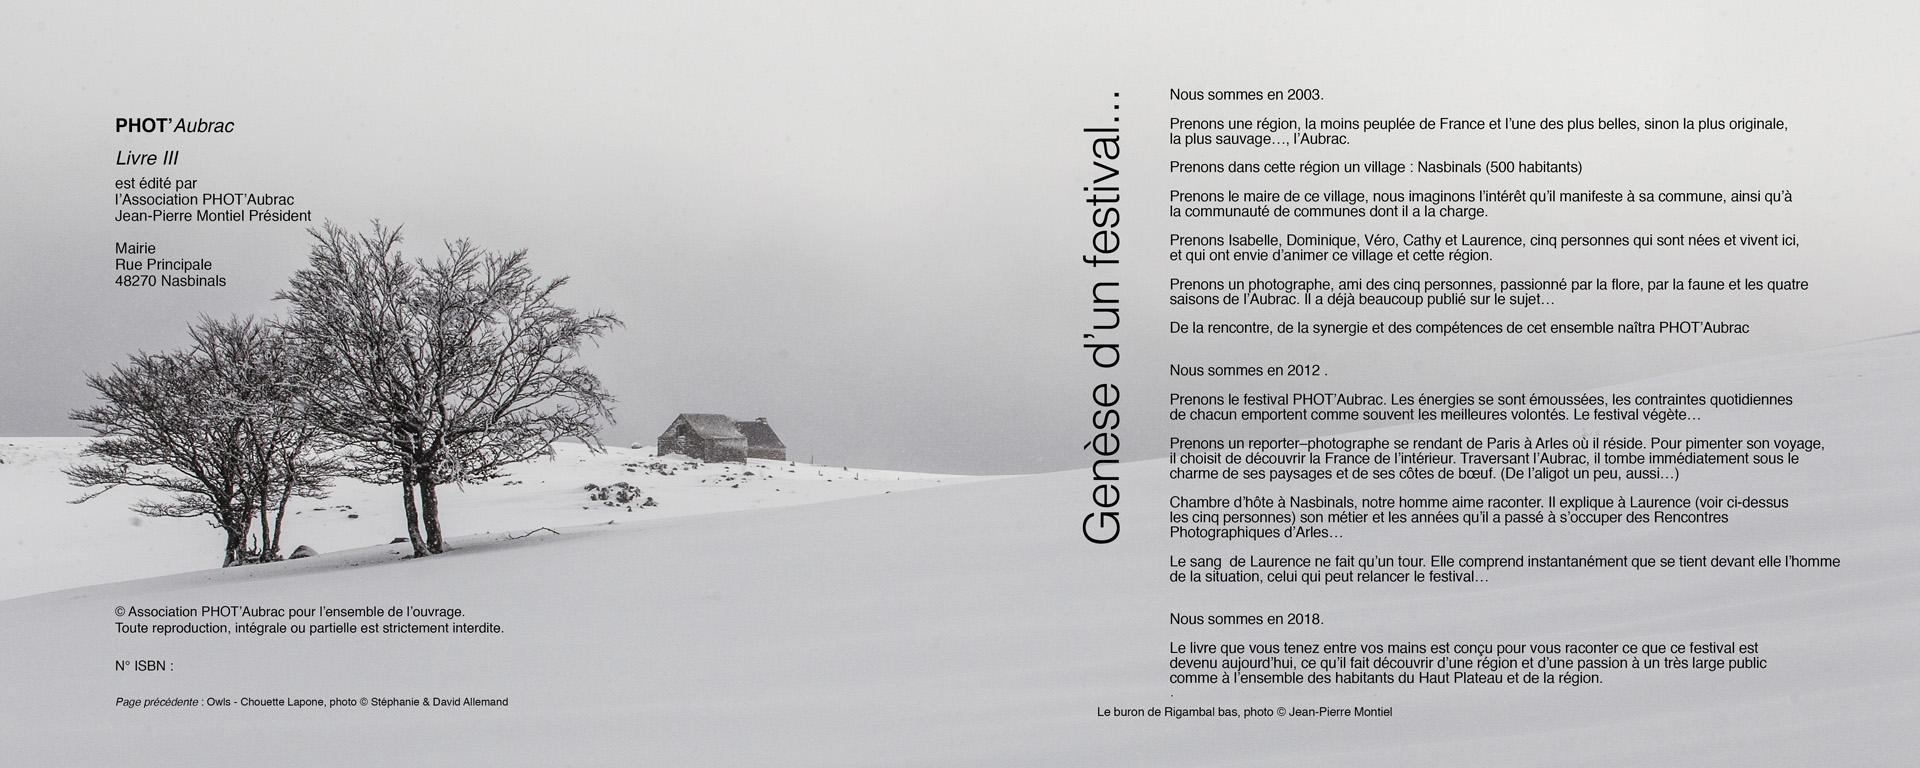 Livre III - PAGES 02-03.jpg